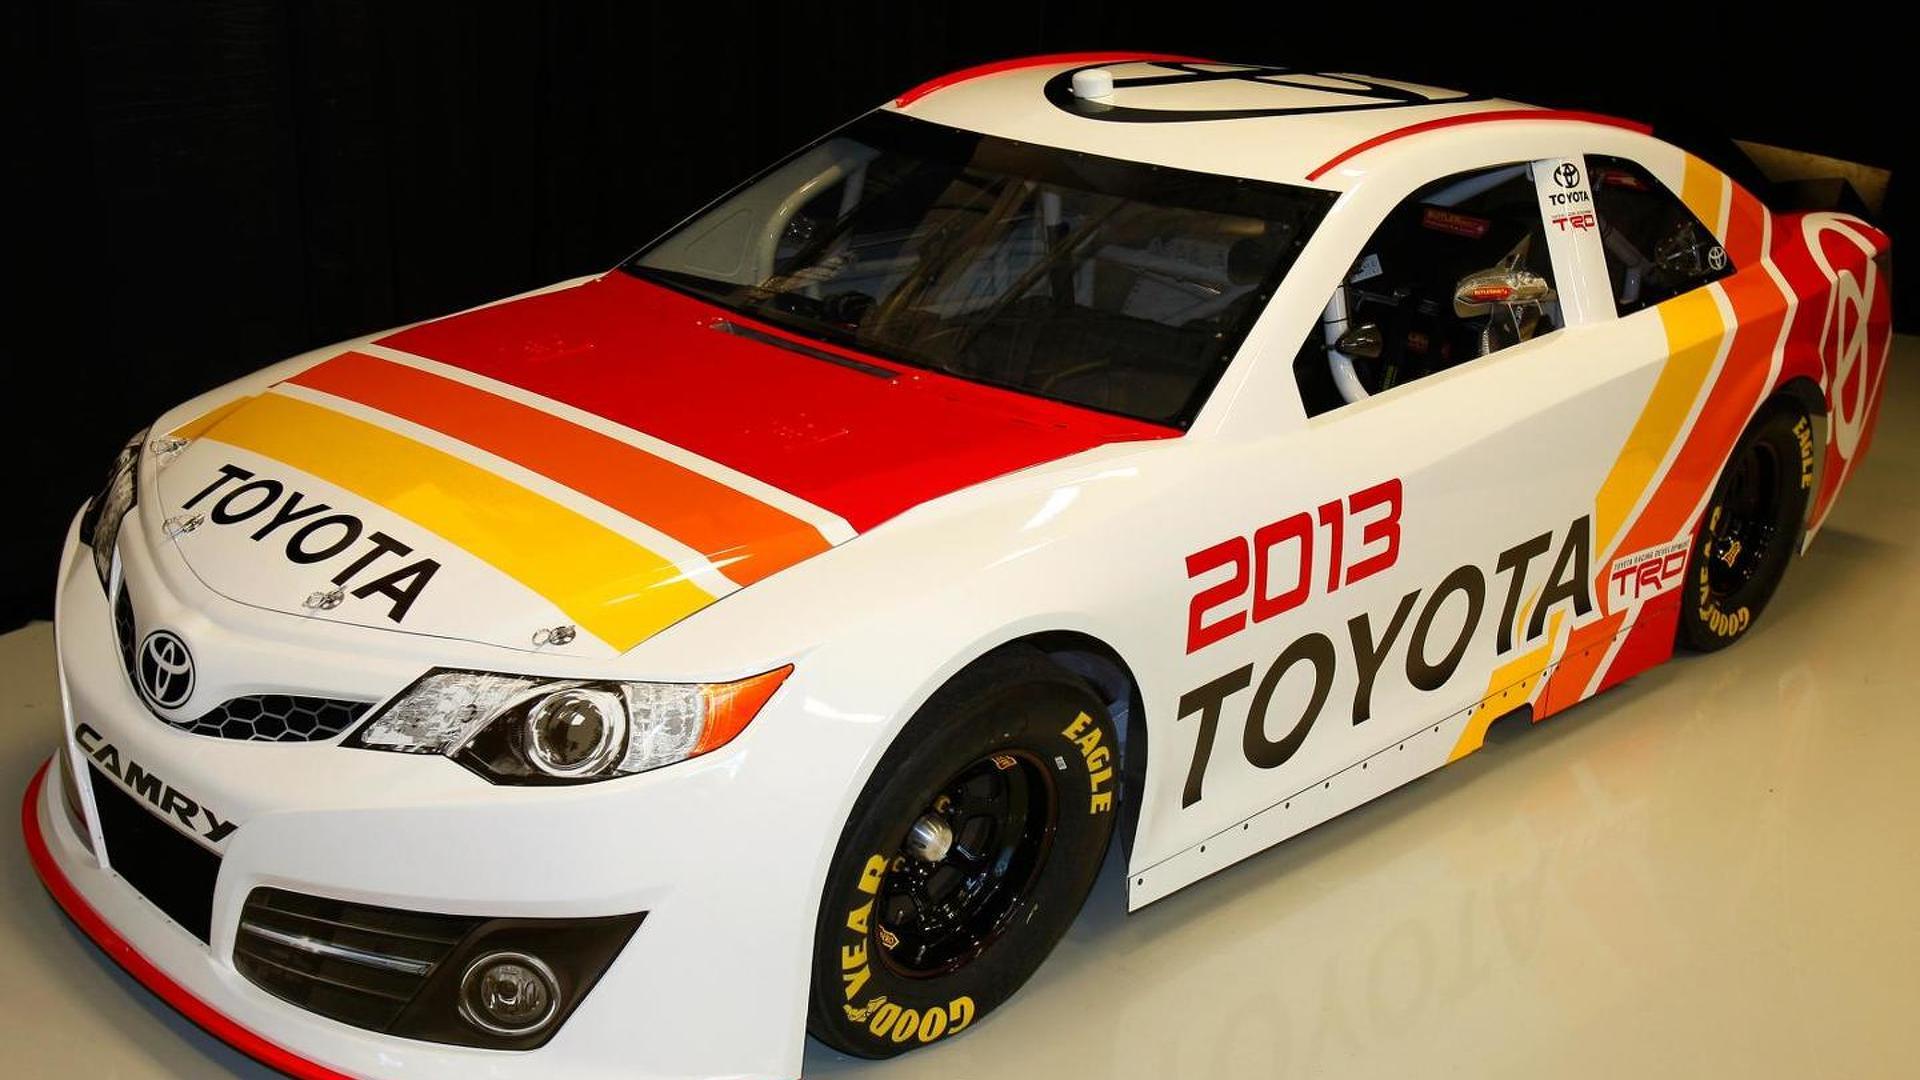 Toyota reveals 2013 NASCAR Sprint Cup Series Camry